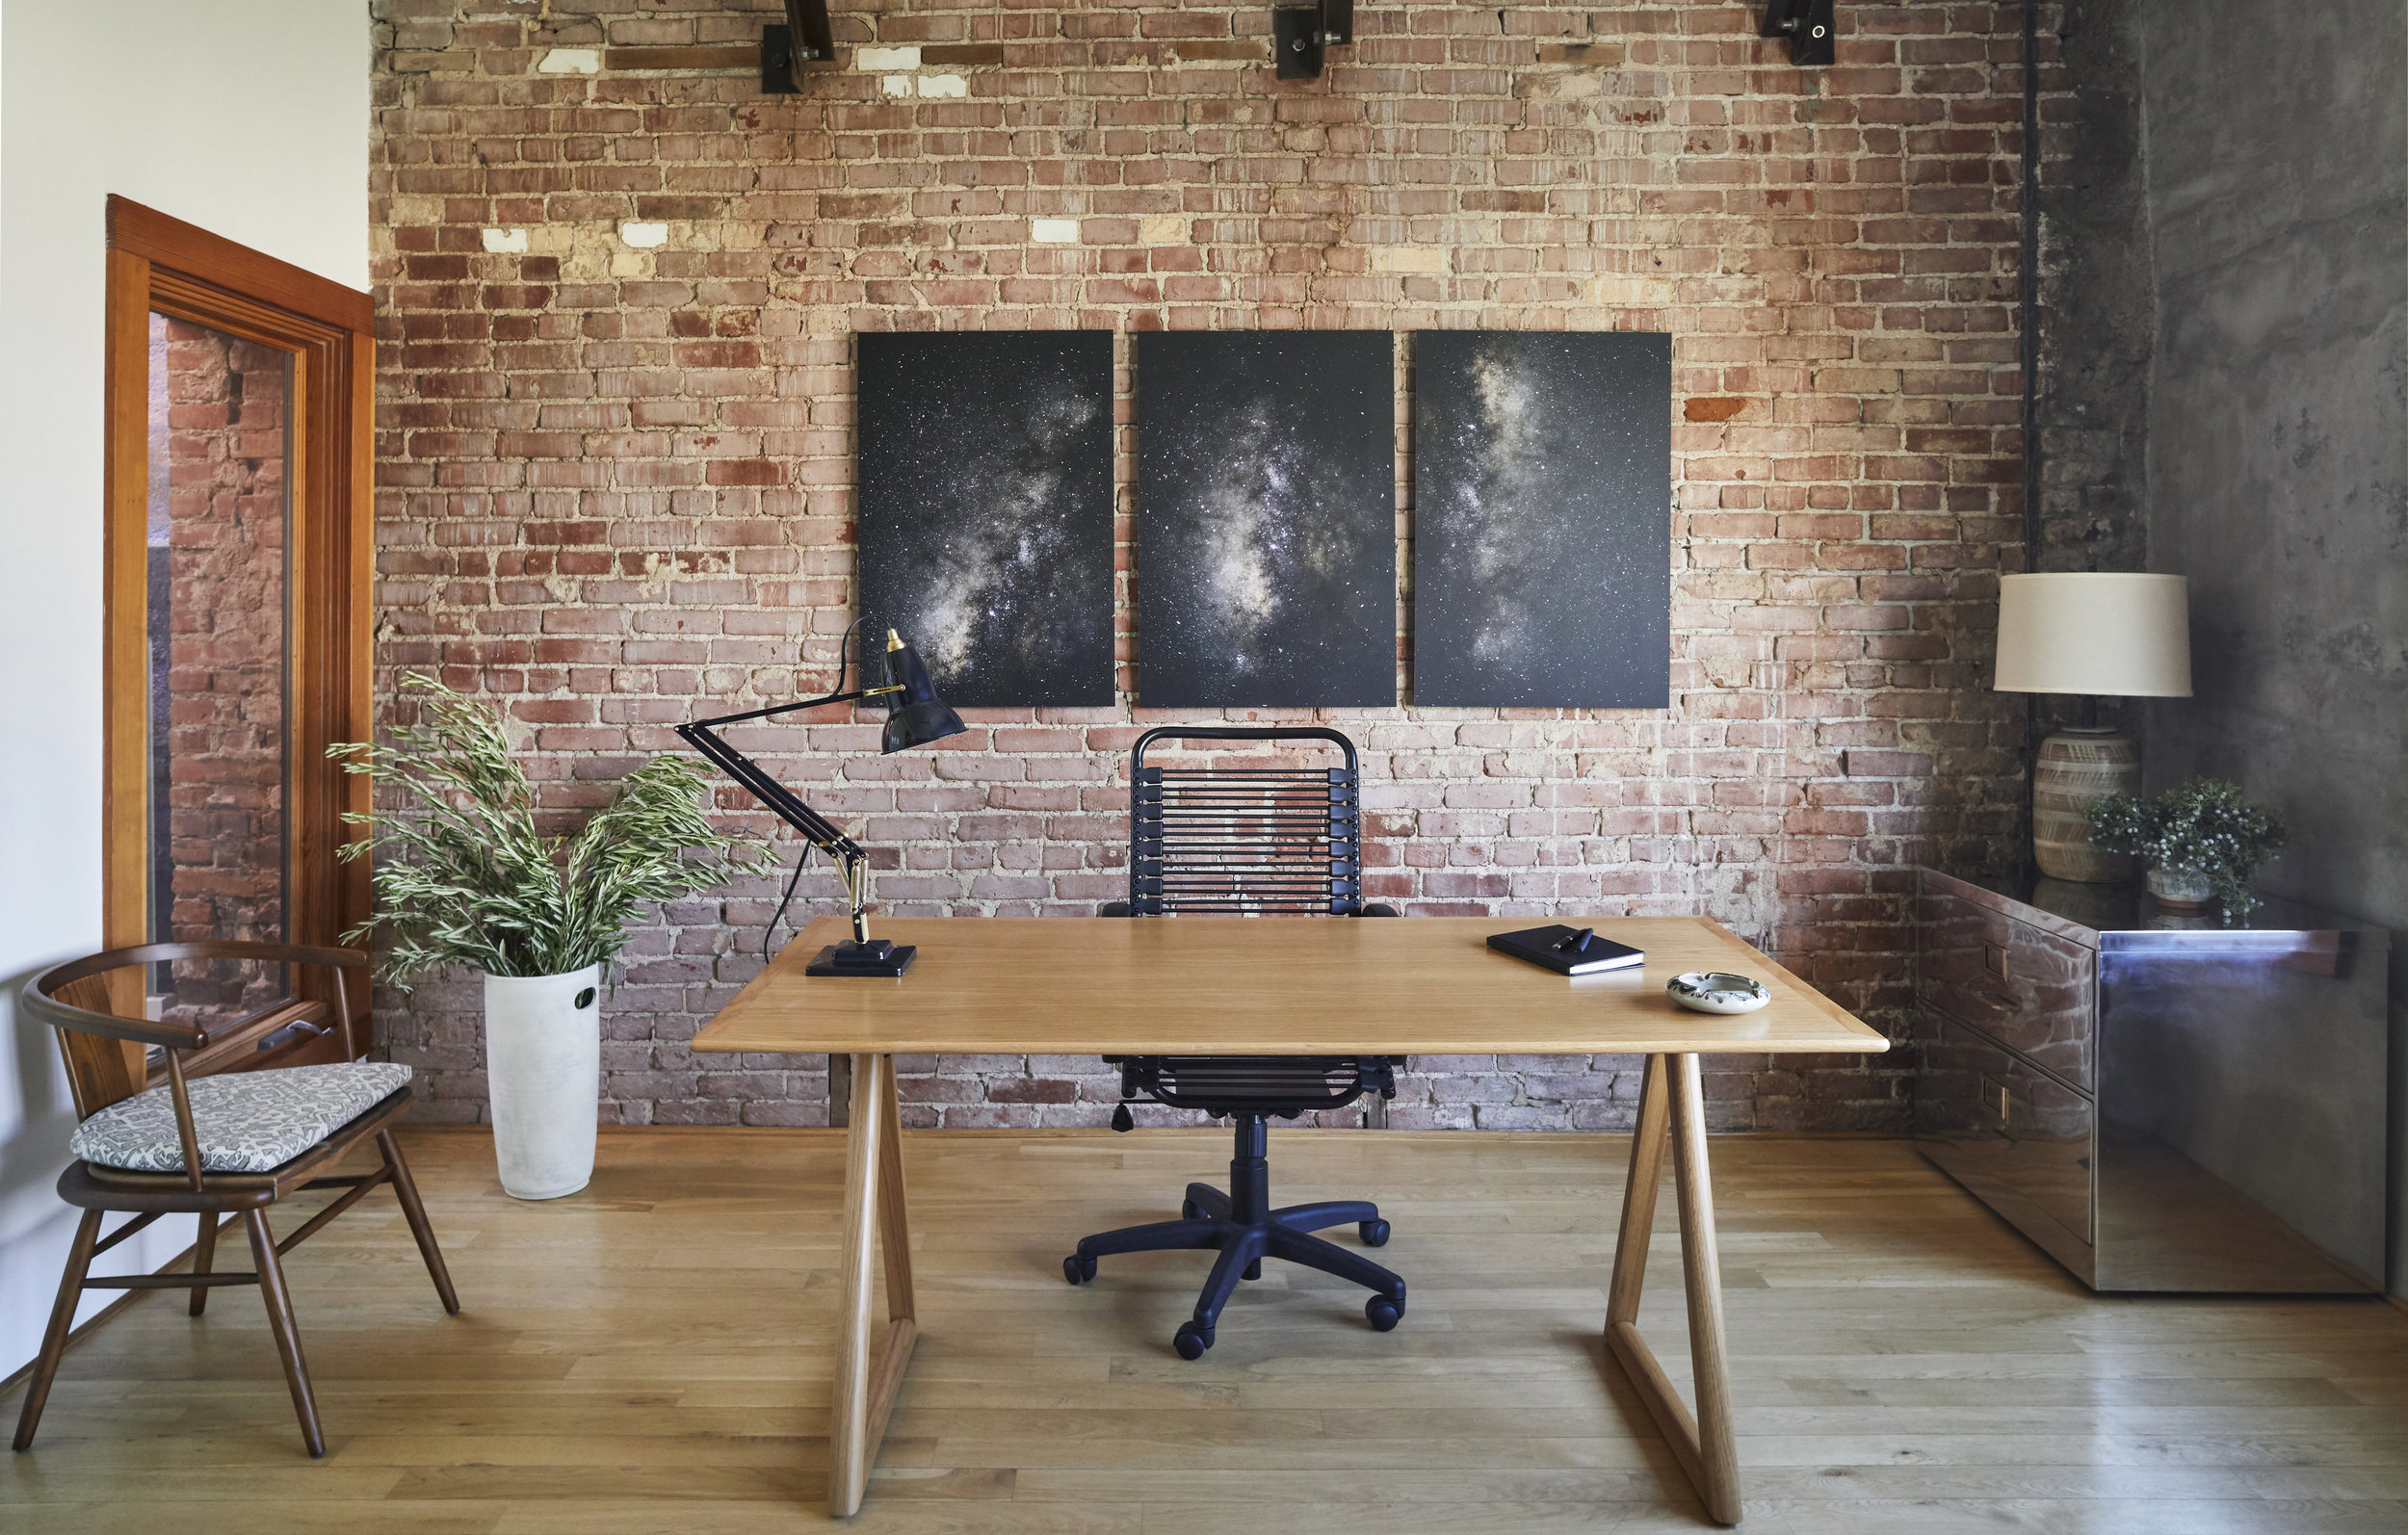 venice-boardwalk-RIVC-venture-capital-office-interiors-by-stefani-stein.jpeg